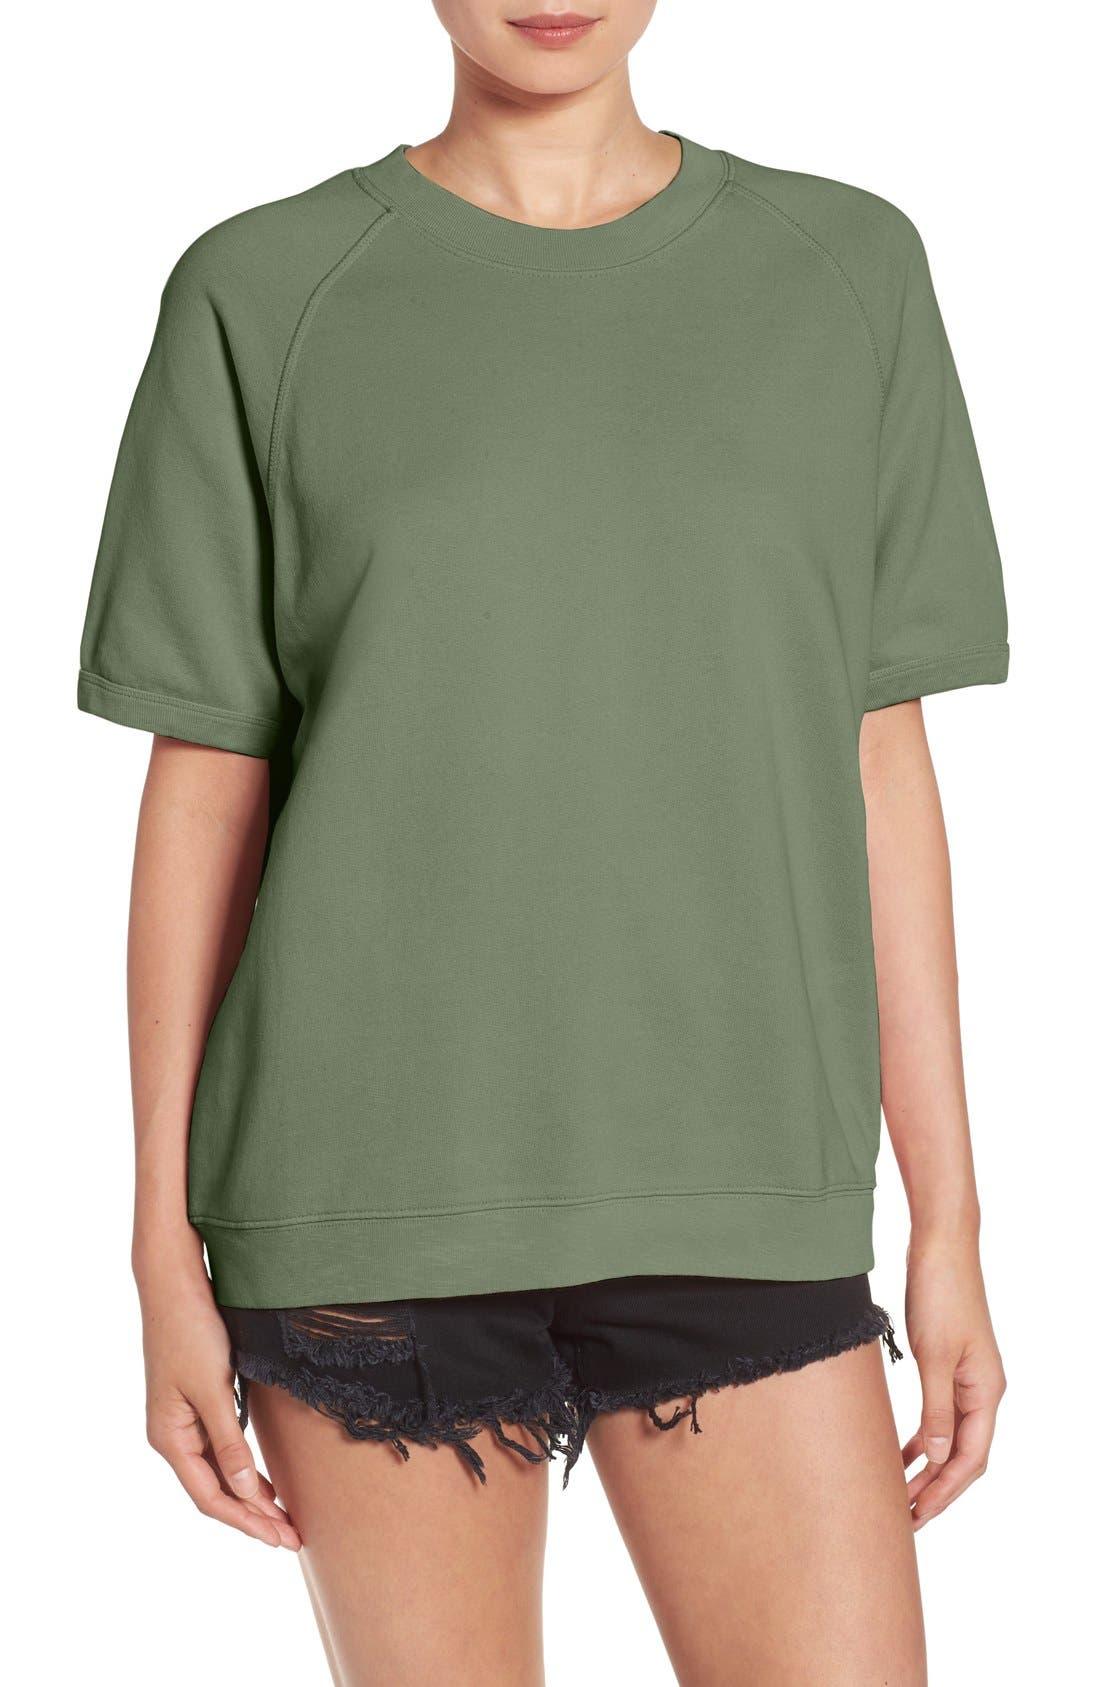 Main Image - Sincerely Jules 'Cara' Short Sleeve Sweatshirt